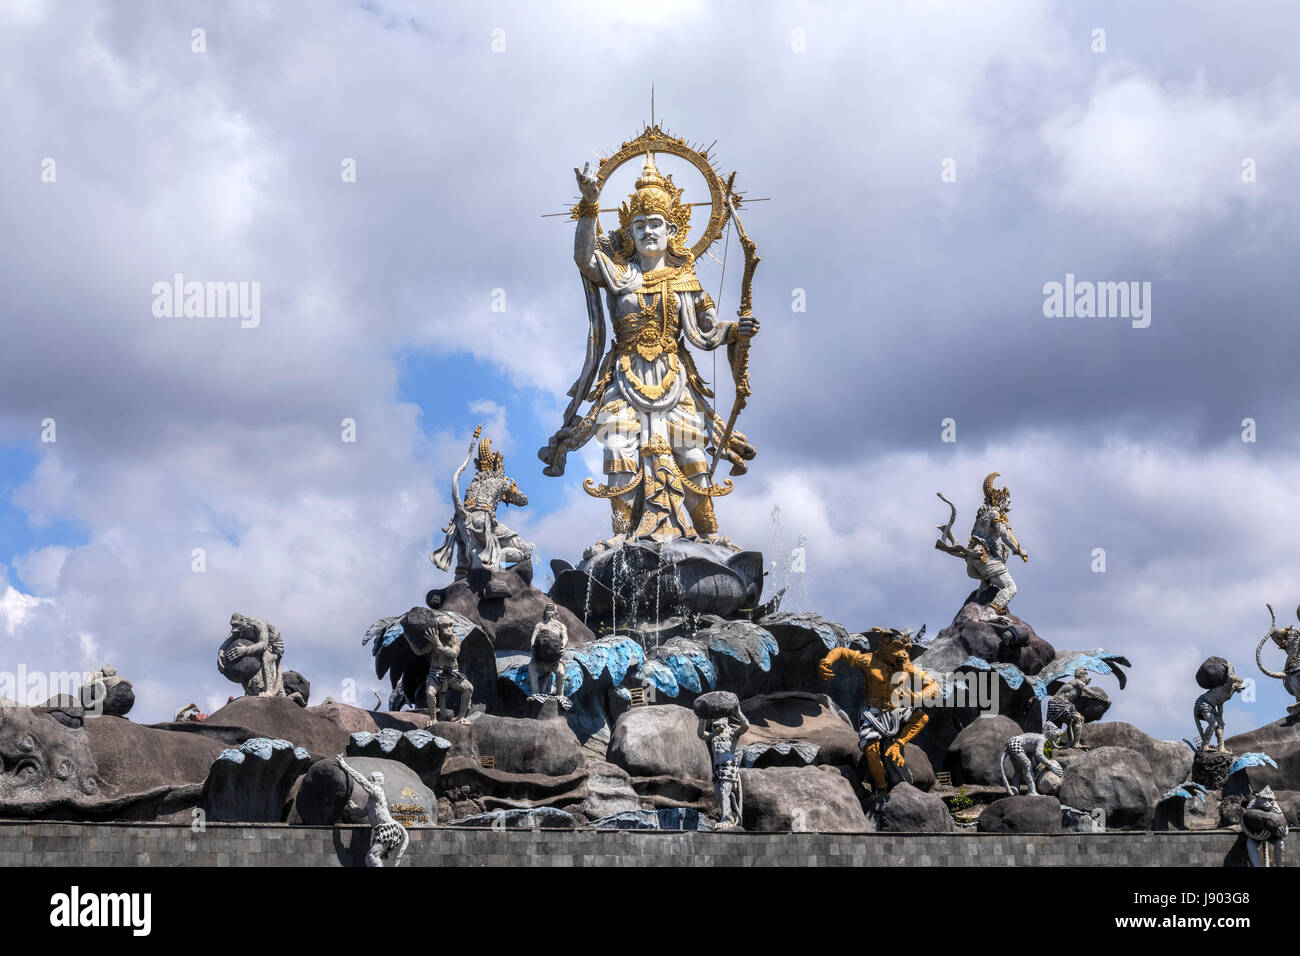 Titi Banda monument, Denpasar, Bali, Indonesia, Asia - Stock Image